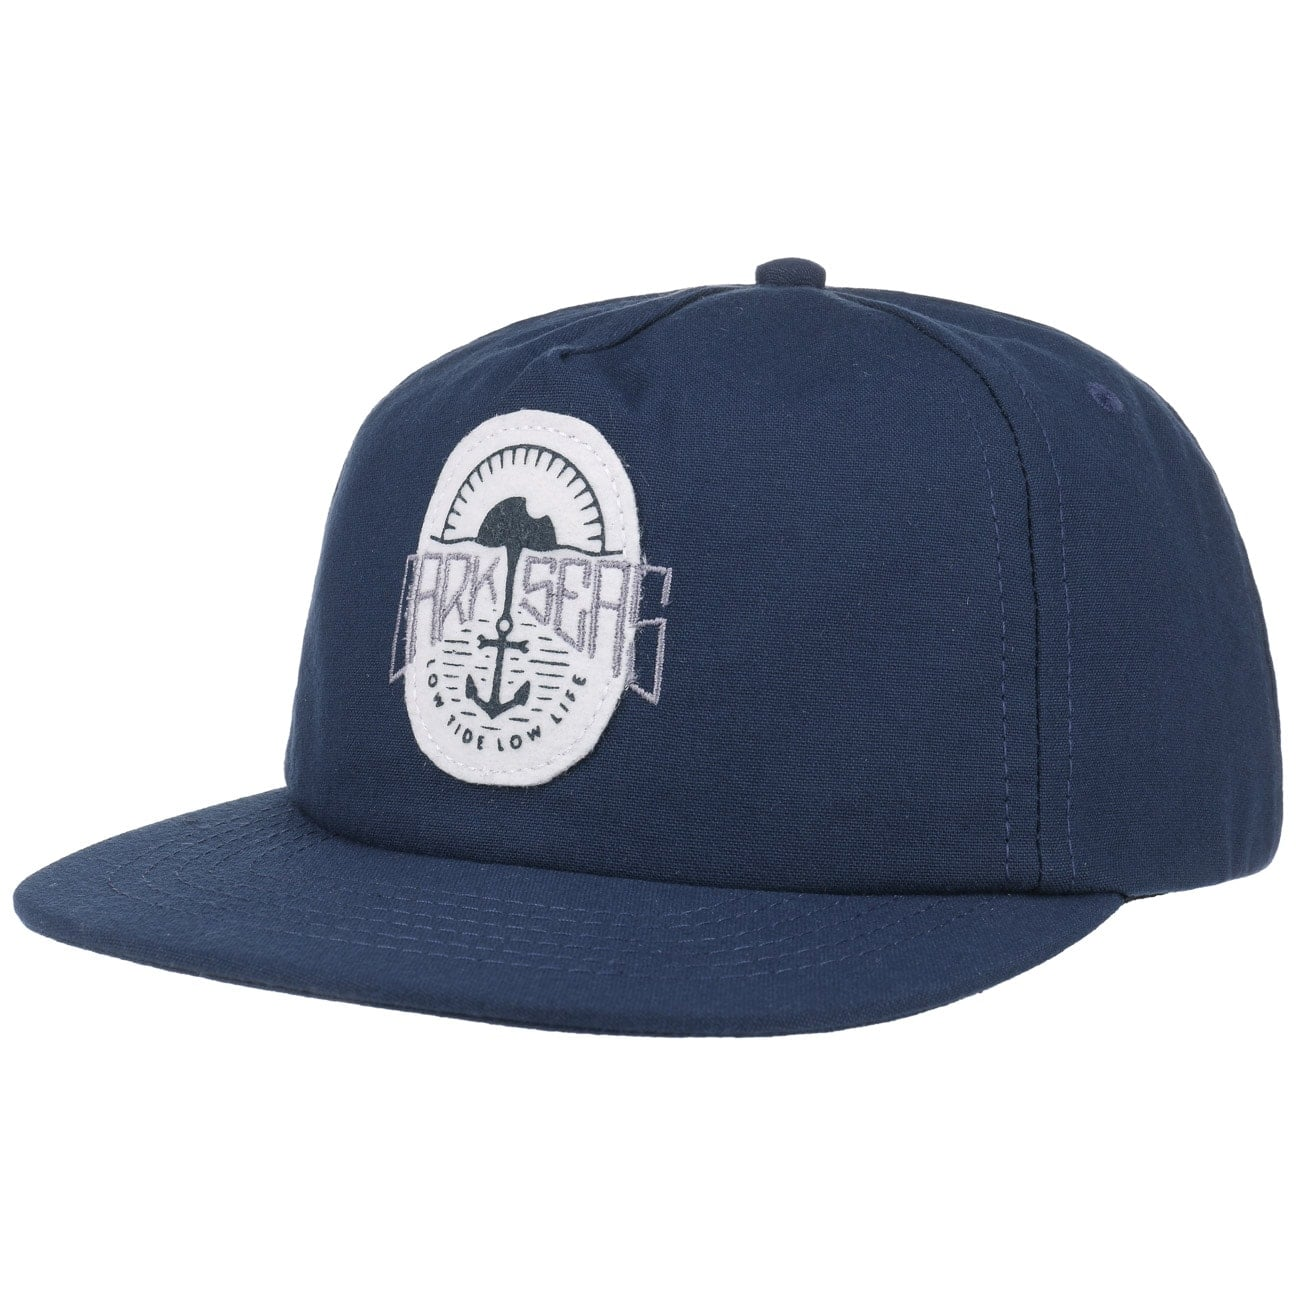 Casquette Snapback Upland by Dark Seas  baseball cap